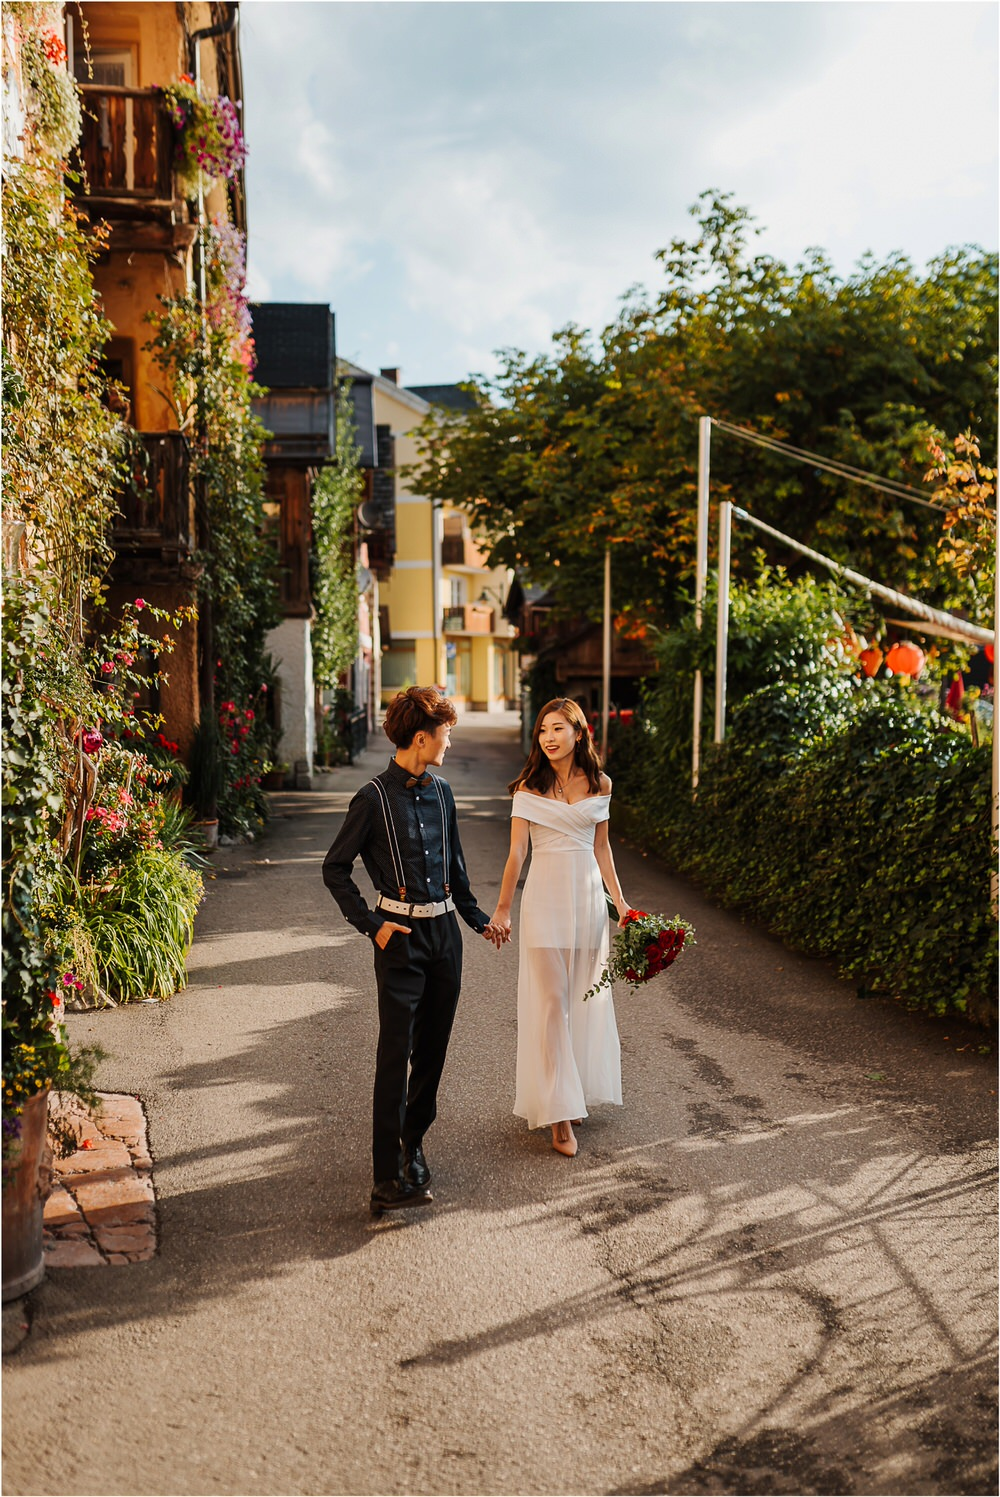 hallstatt austria wedding engagement photographer asian proposal surprise photography recommended nature professional 0031.jpg